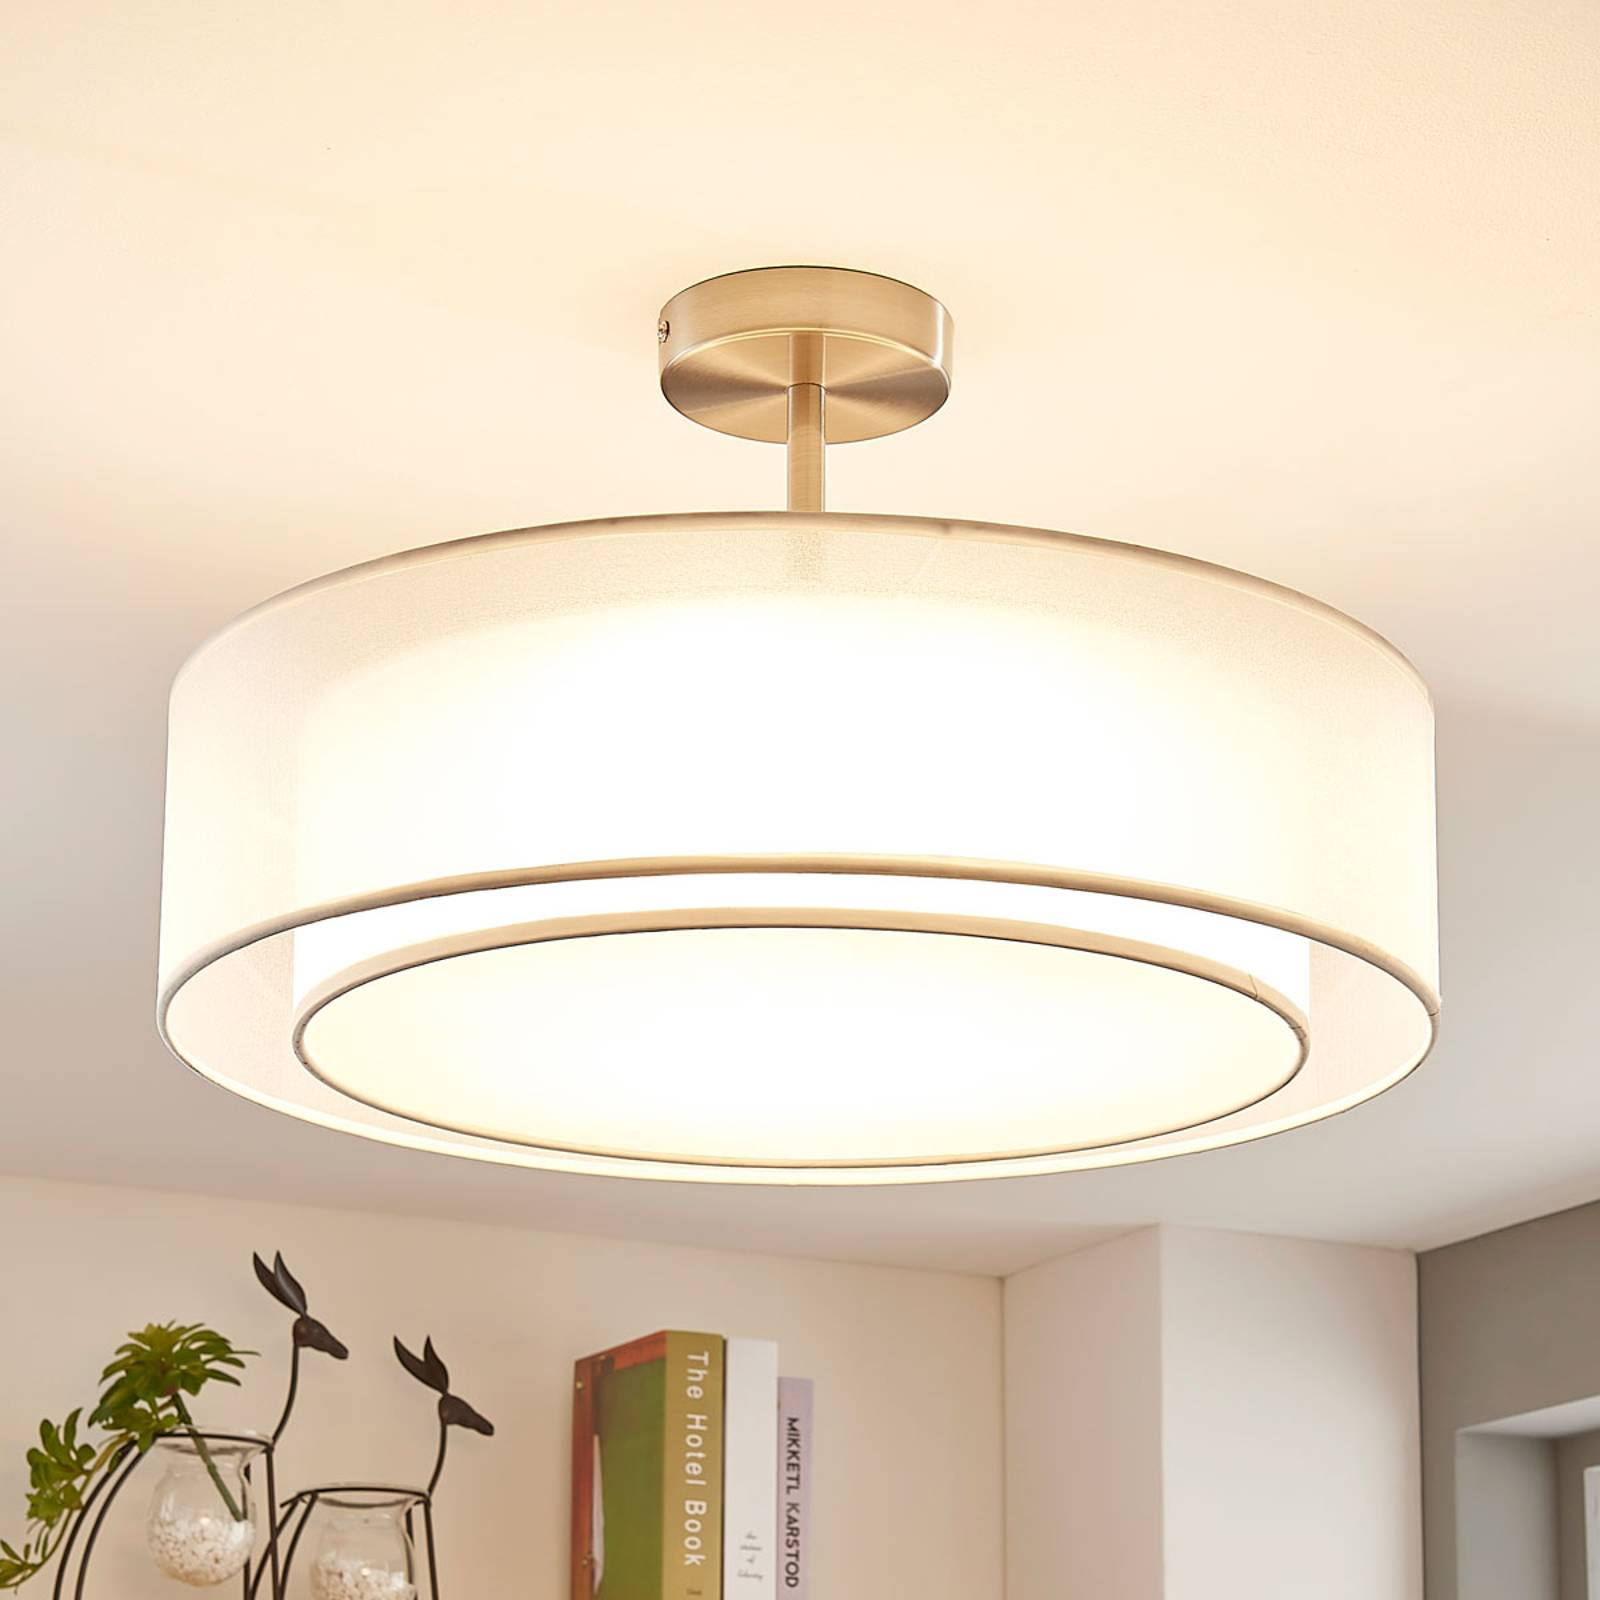 LED plafondlamp Pikka, 3-traps dimbaar, wit